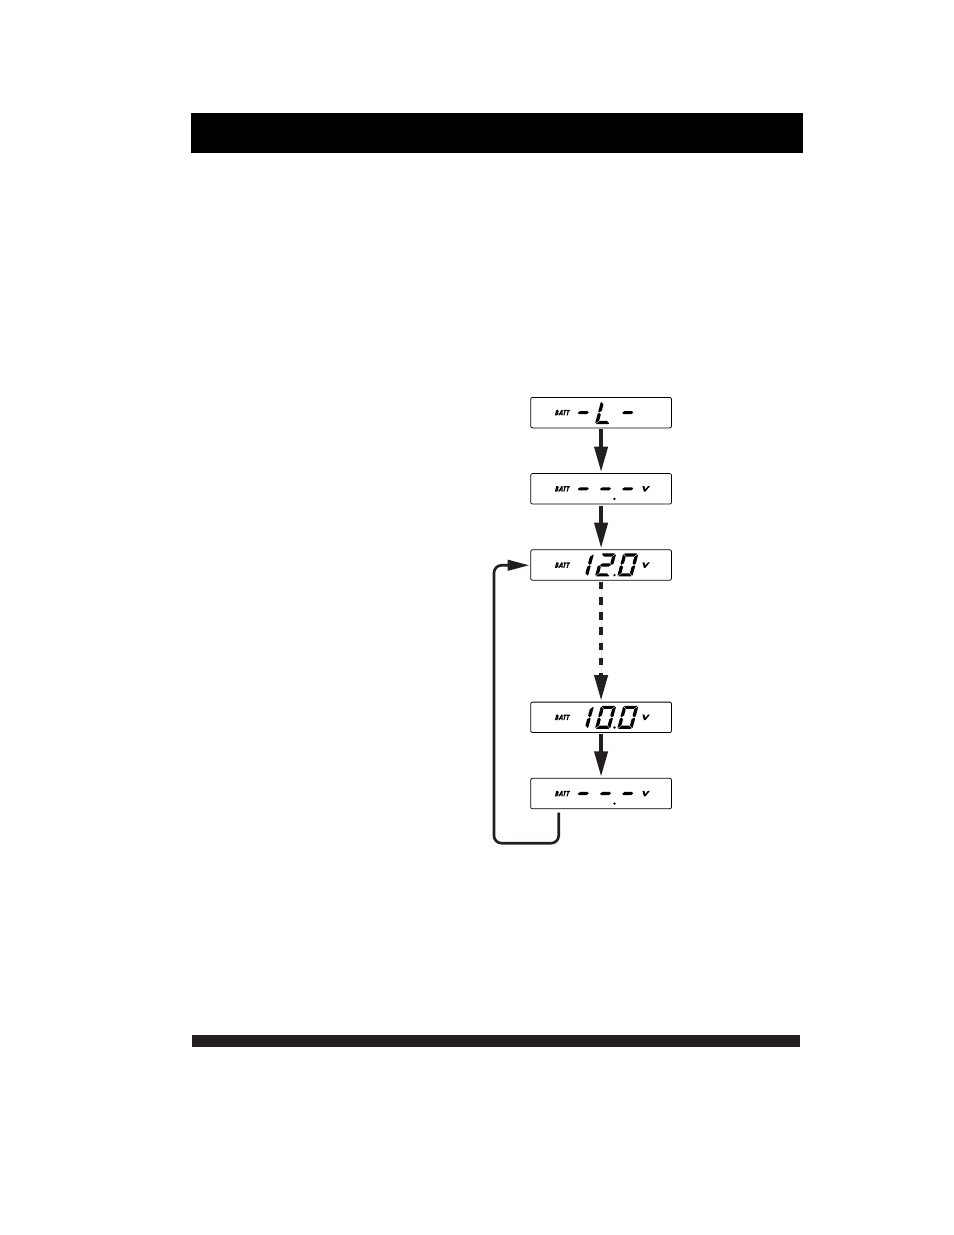 Free Download Turbo Timer Wiring Diagram on